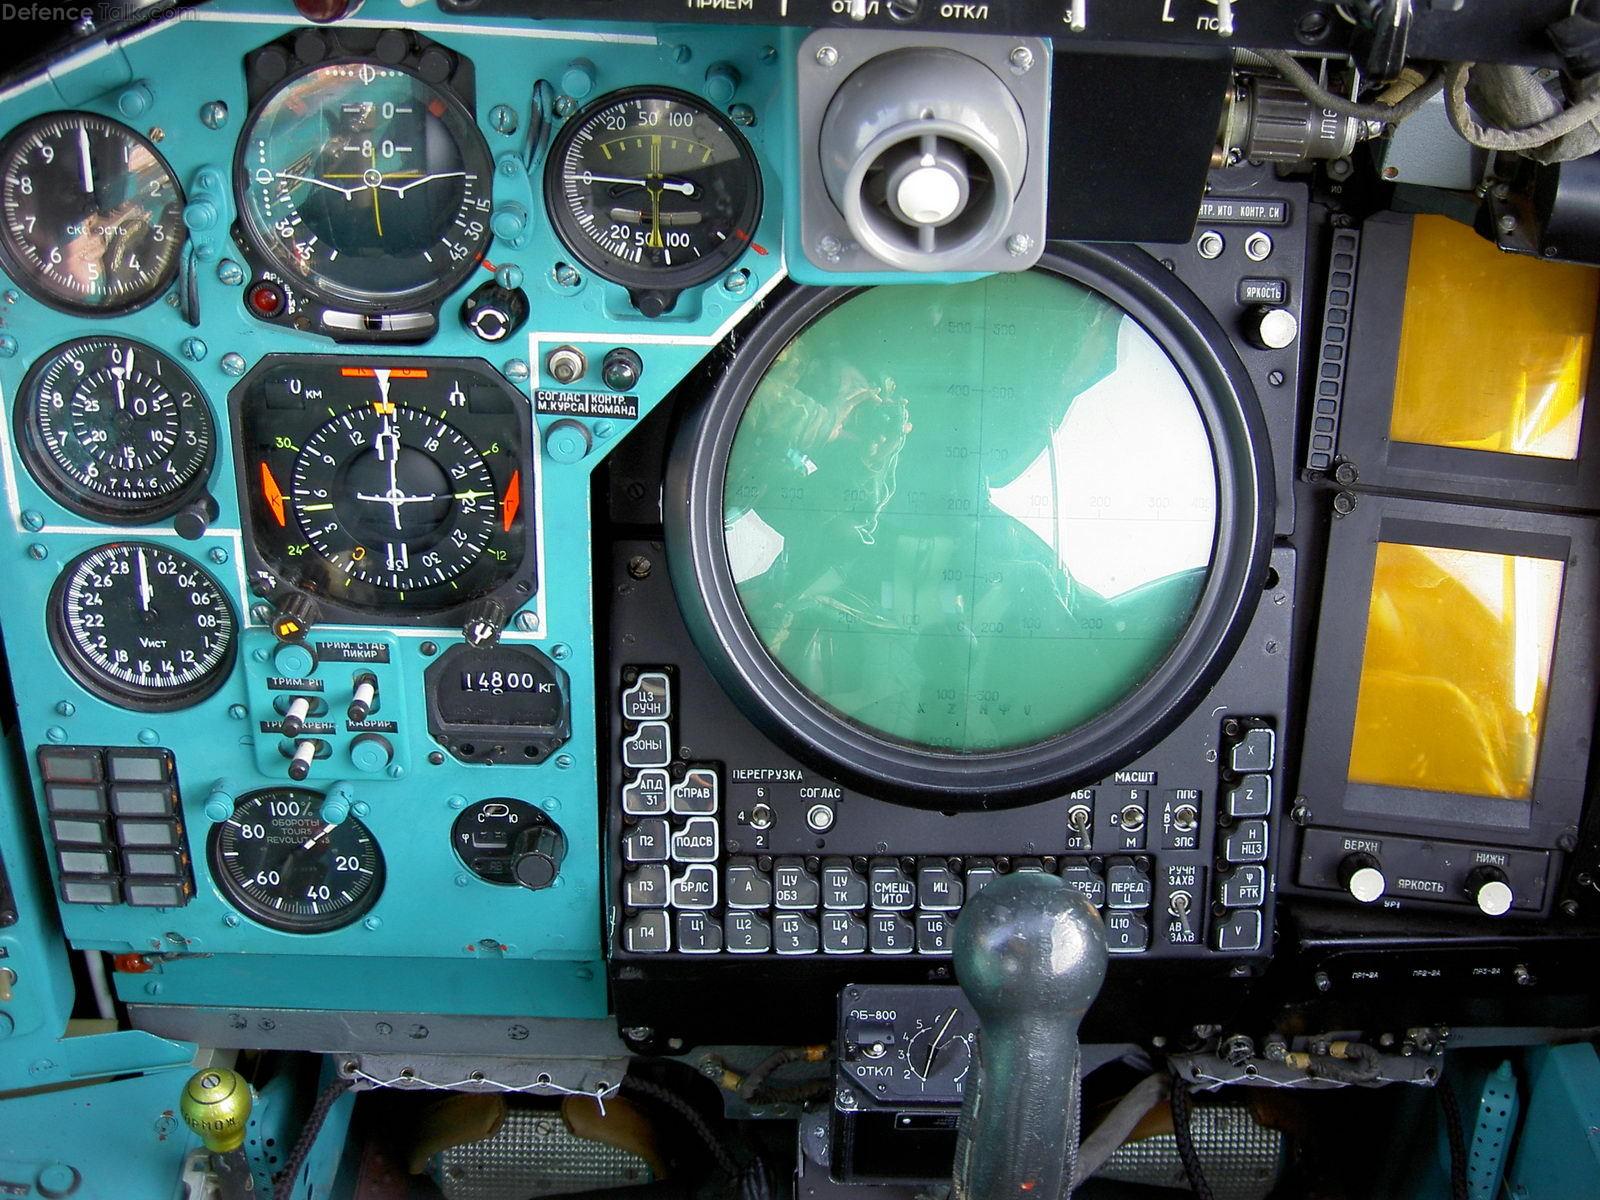 rear-cockpit-radar-scope-and-control-stick-head.-1.jpg